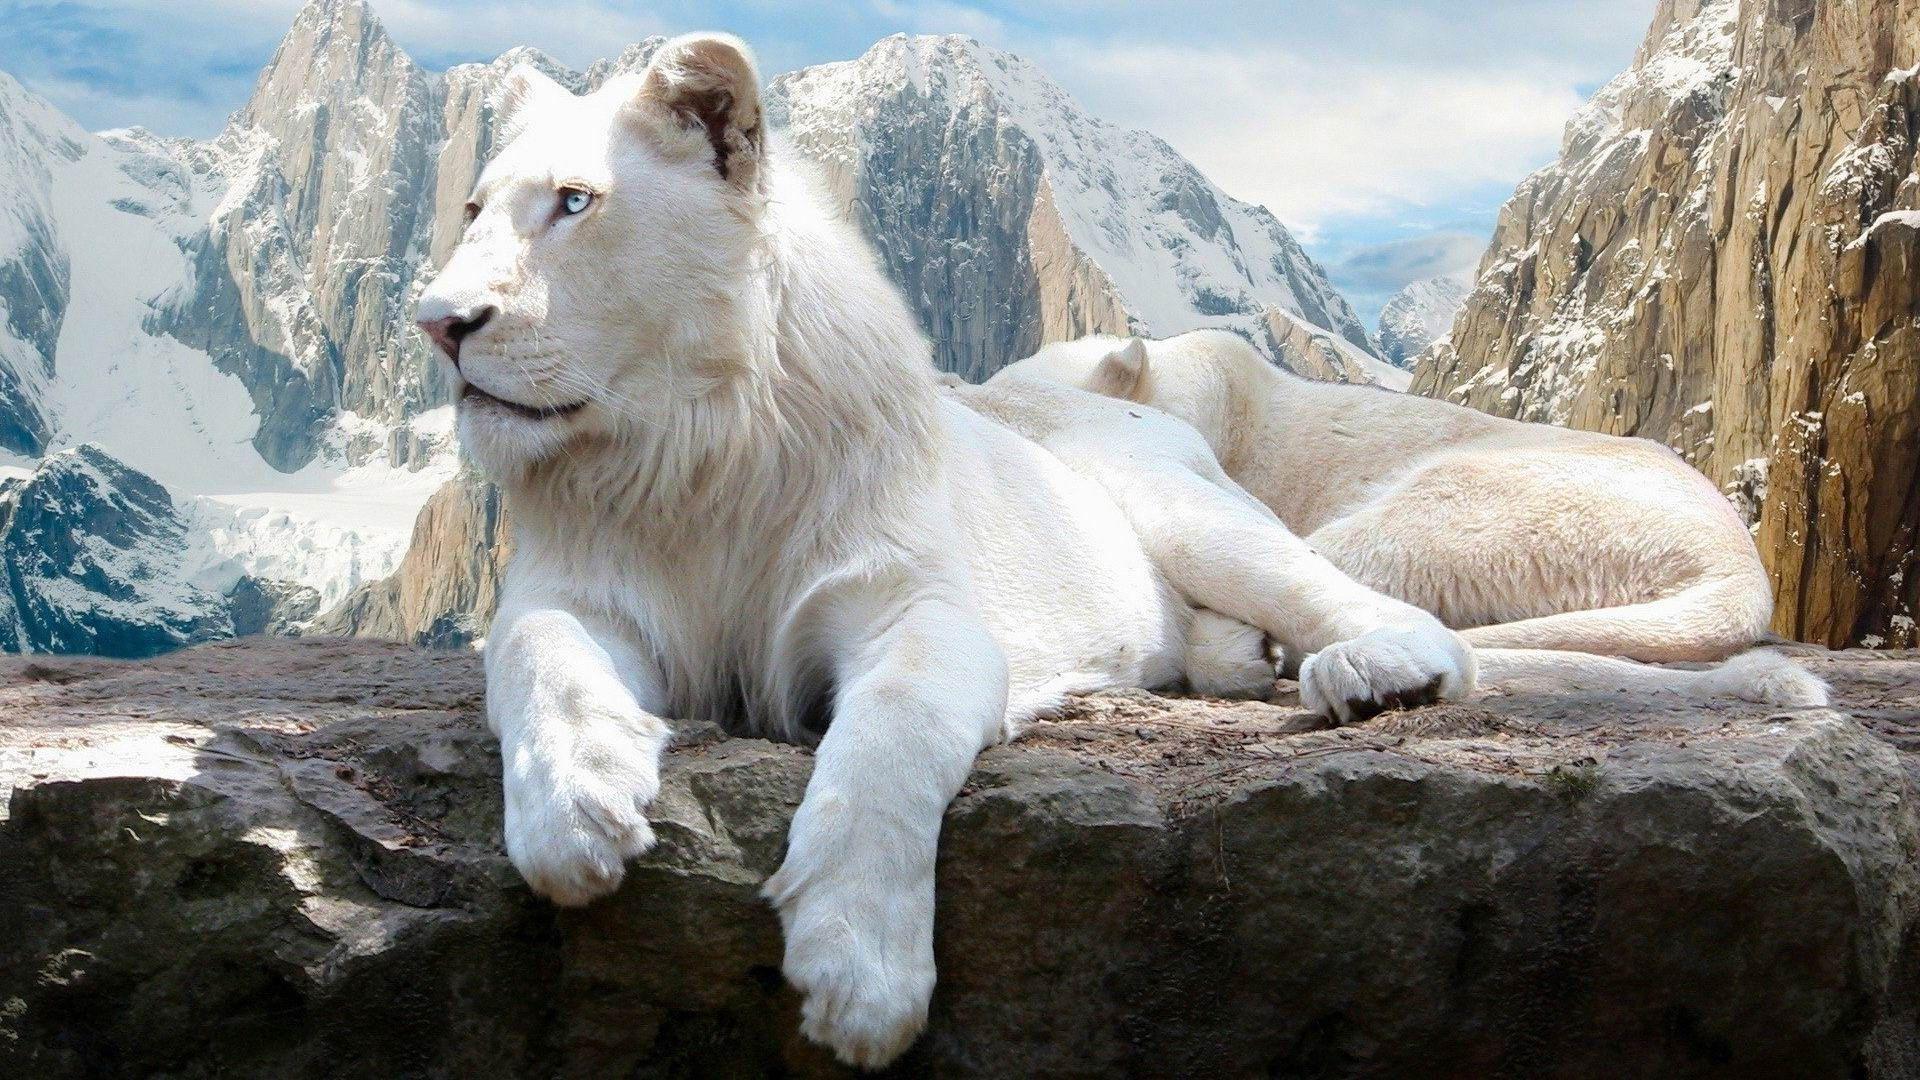 Http Www 10wallpaper Com Wallpaper 1920x1080 1301 White Lion Cute Animals Wallpaper 1920x1080 Jpg Photos De Lion Animales Animaux